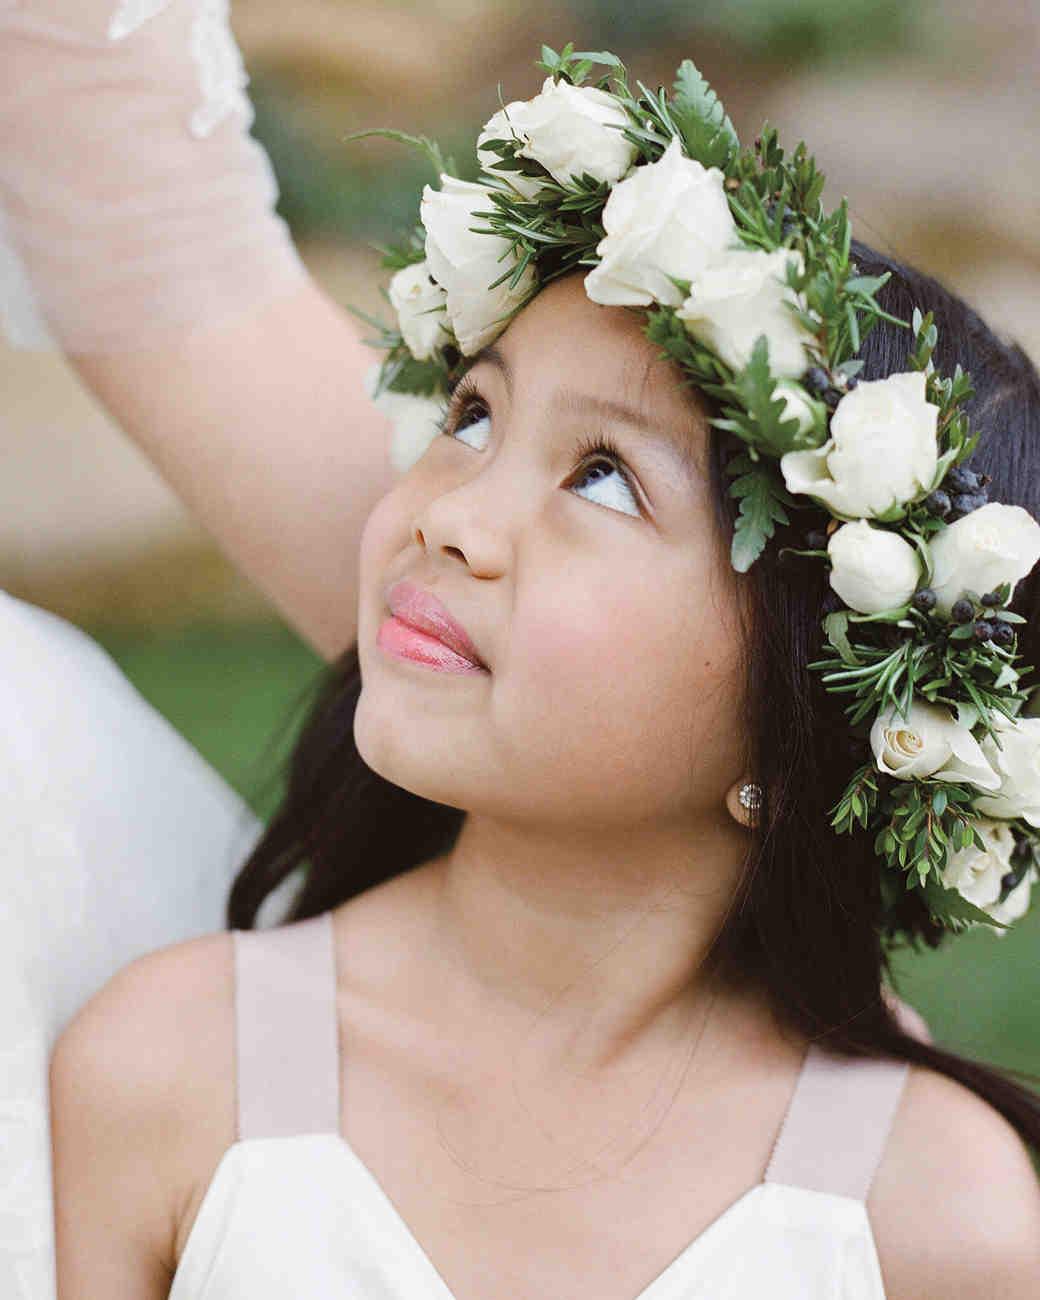 adriana-han-wedding-57950005-s111814.jpg